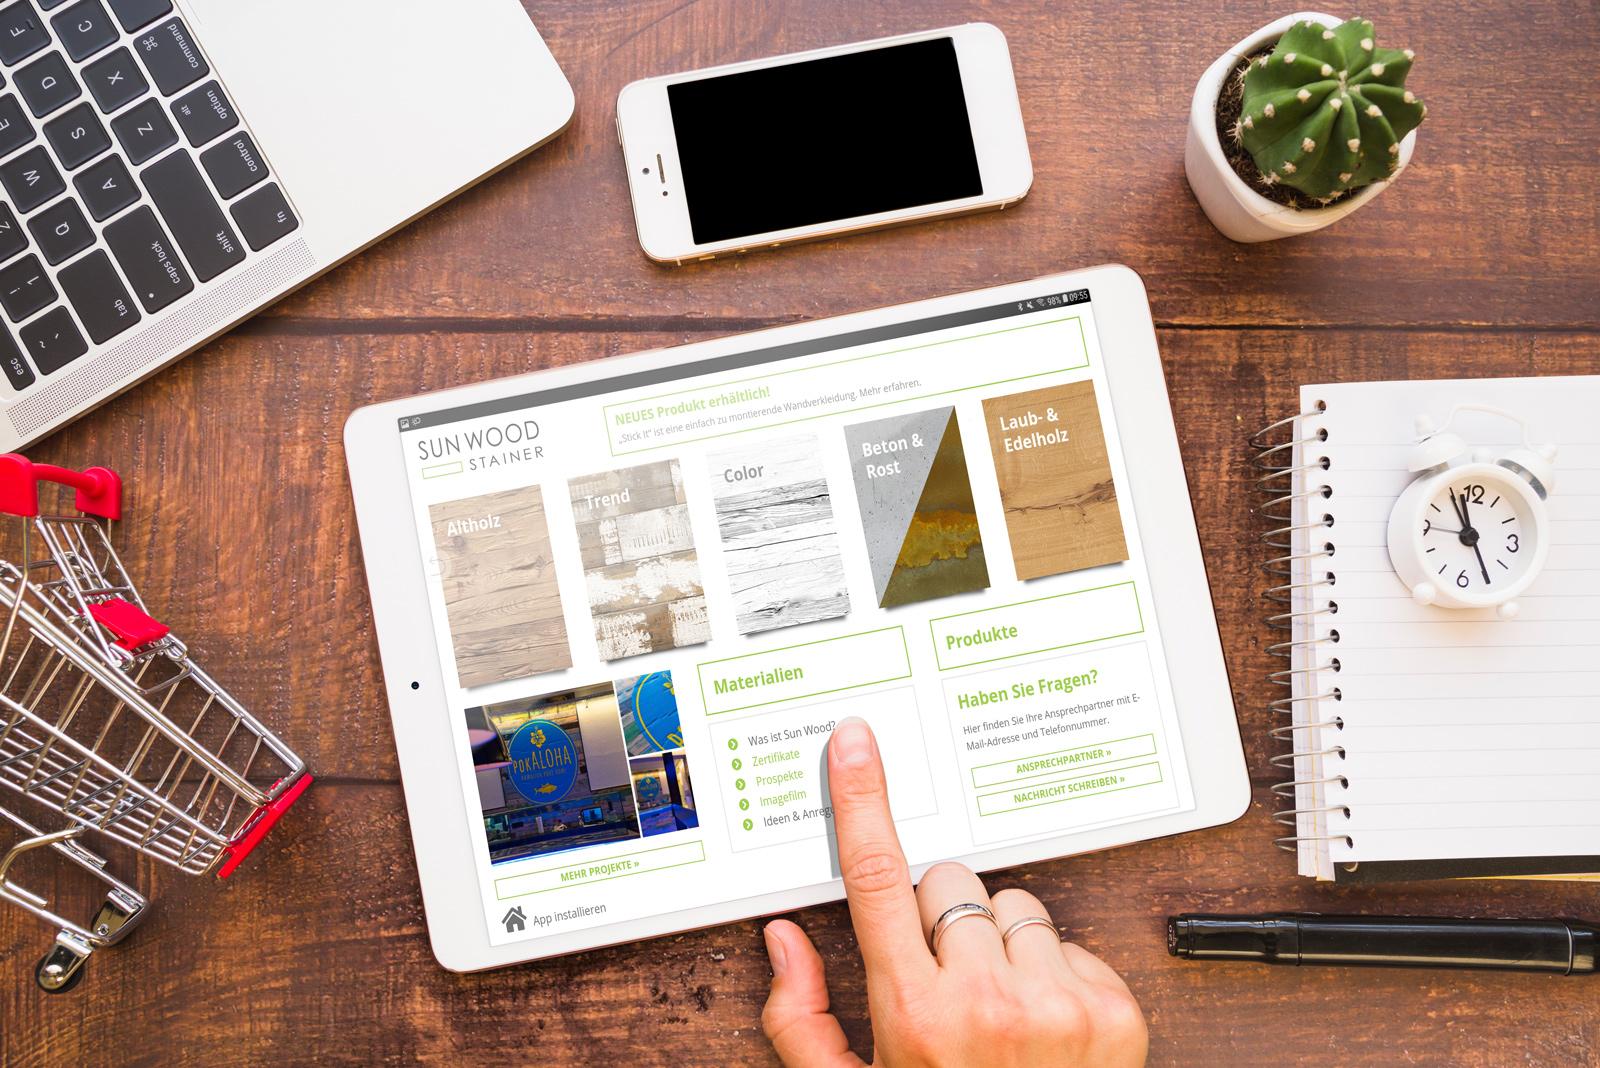 App auf iPad Tablet